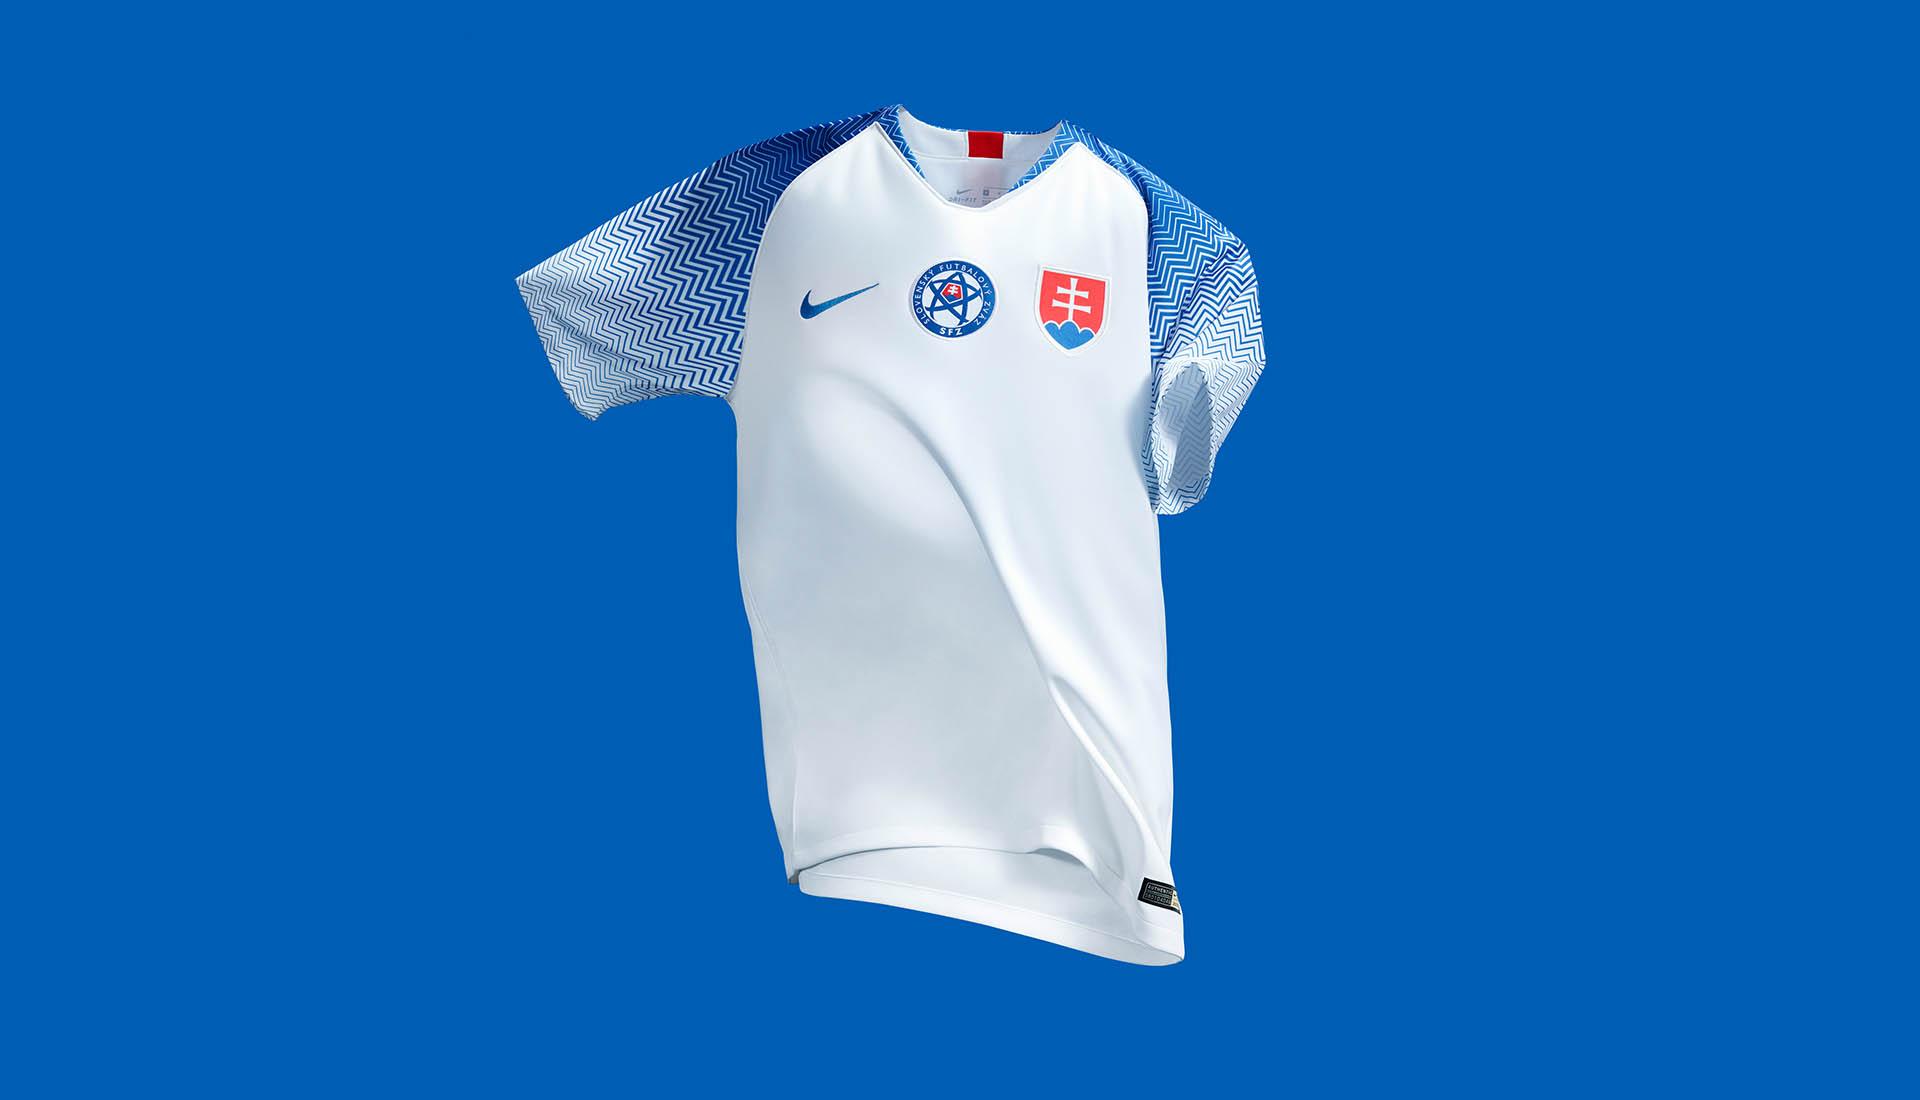 81df8e53aff Nike Launch 2018 Slovakia Home Kit - SoccerBible.